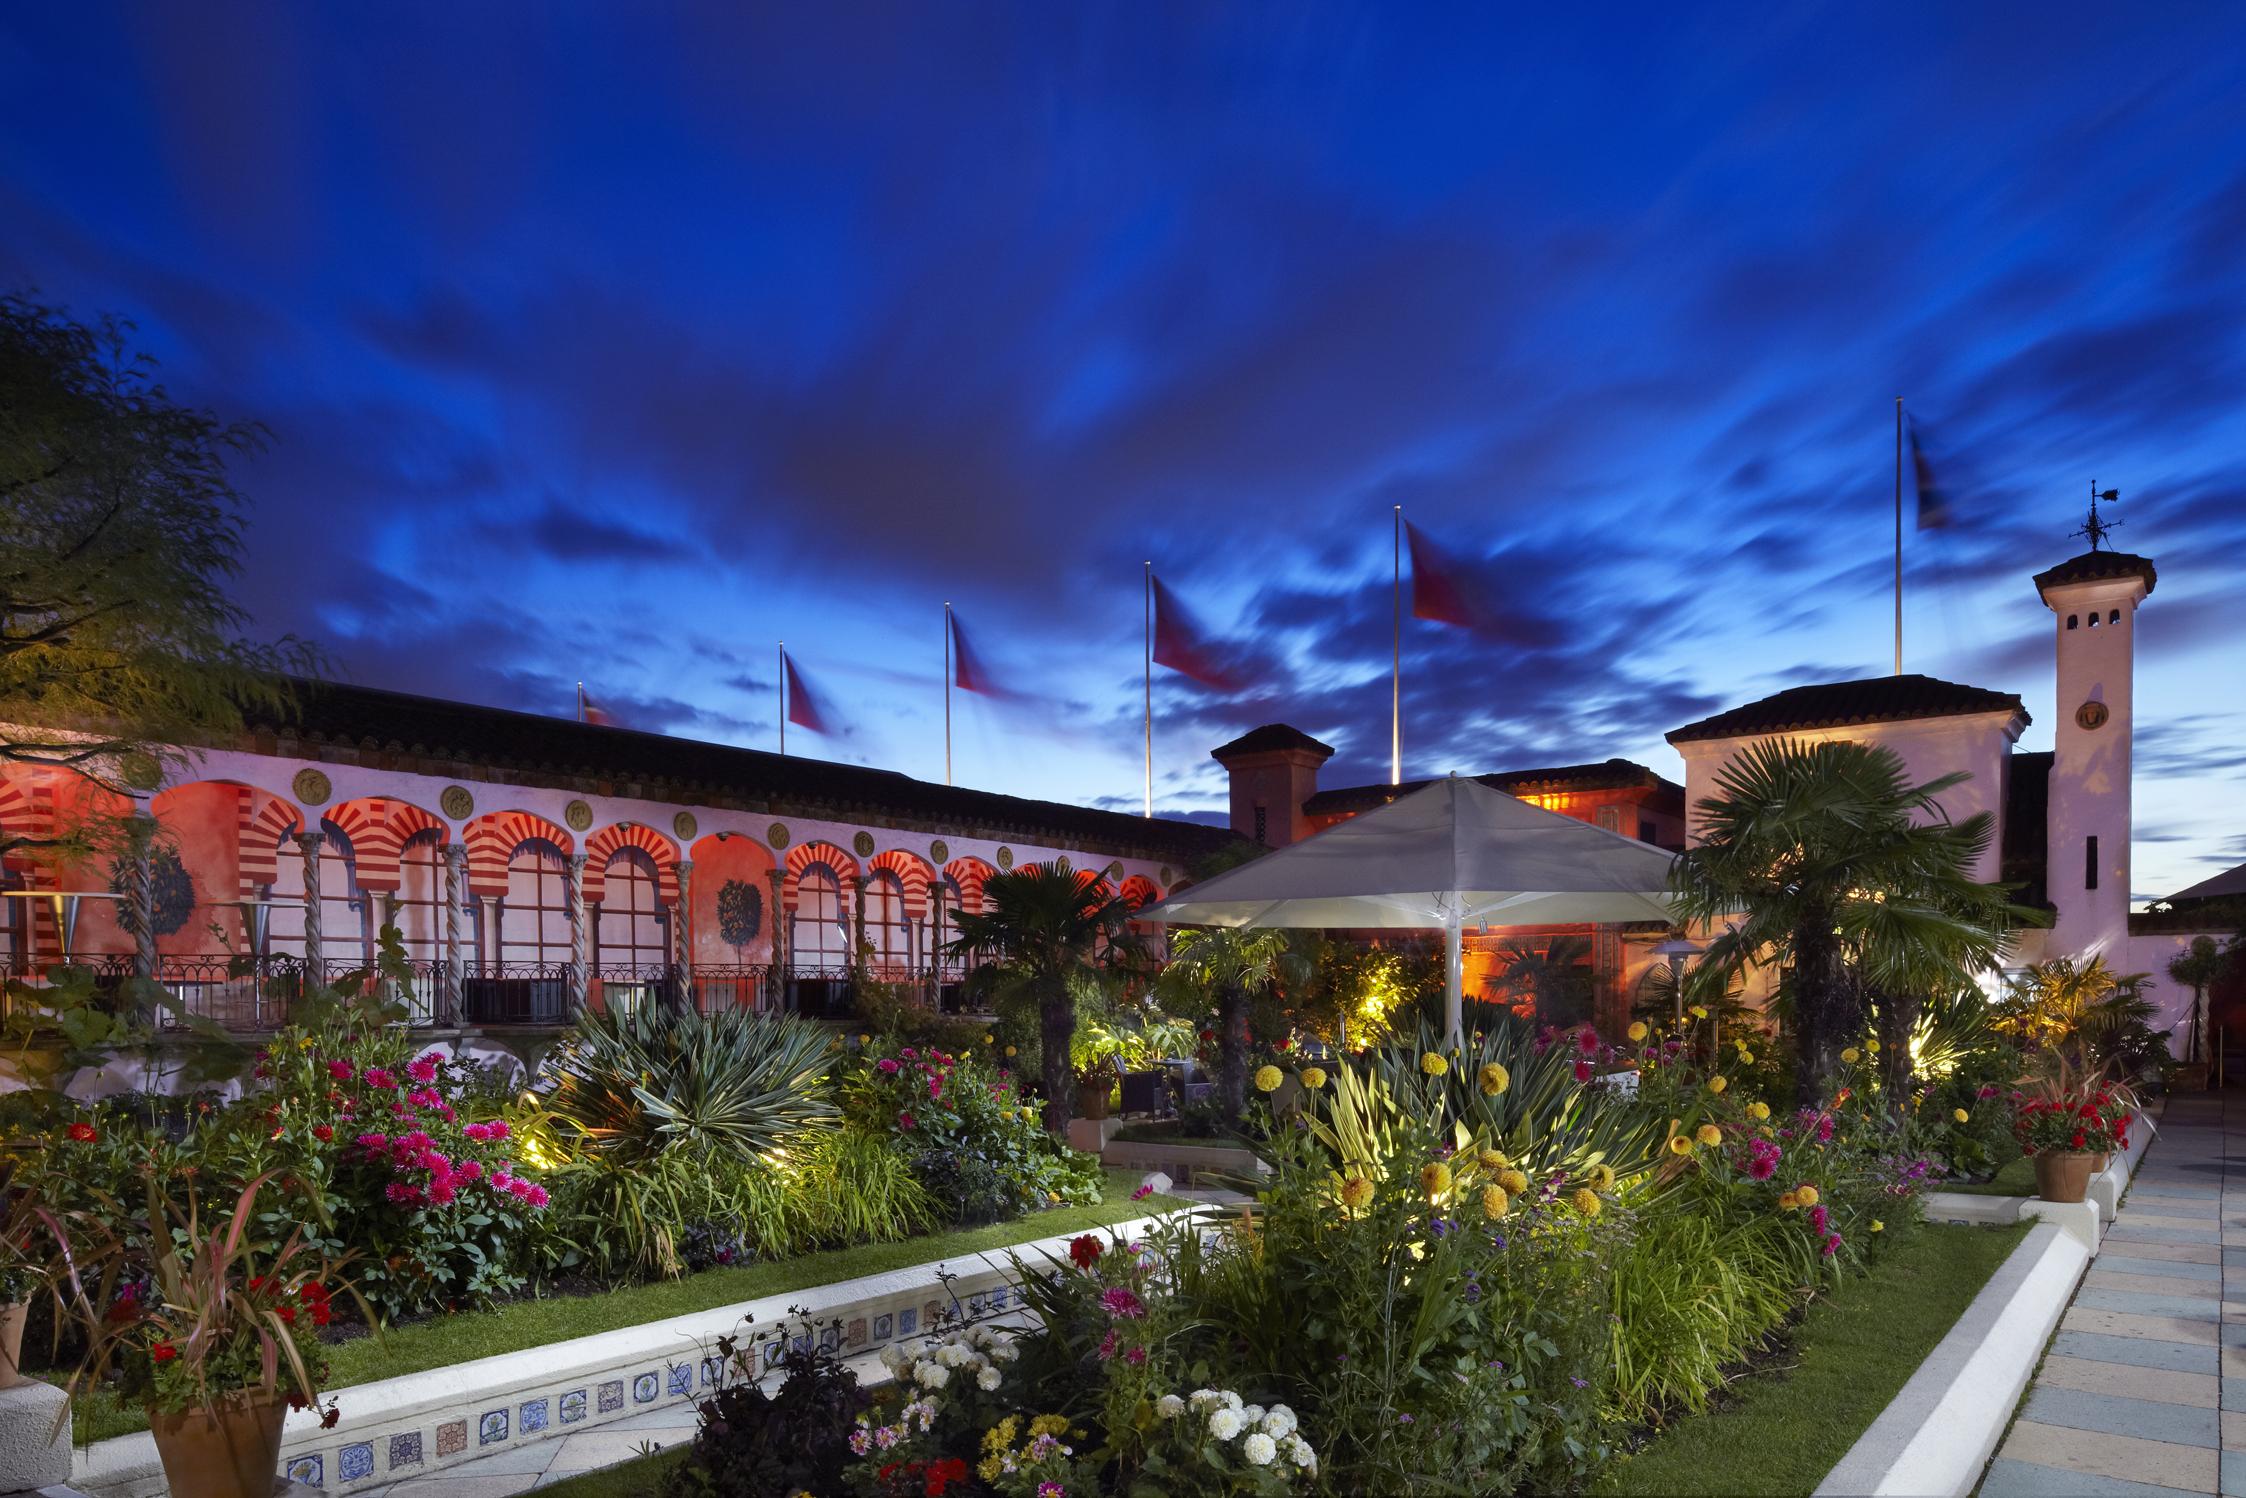 rooftop gardens bar photo - 2